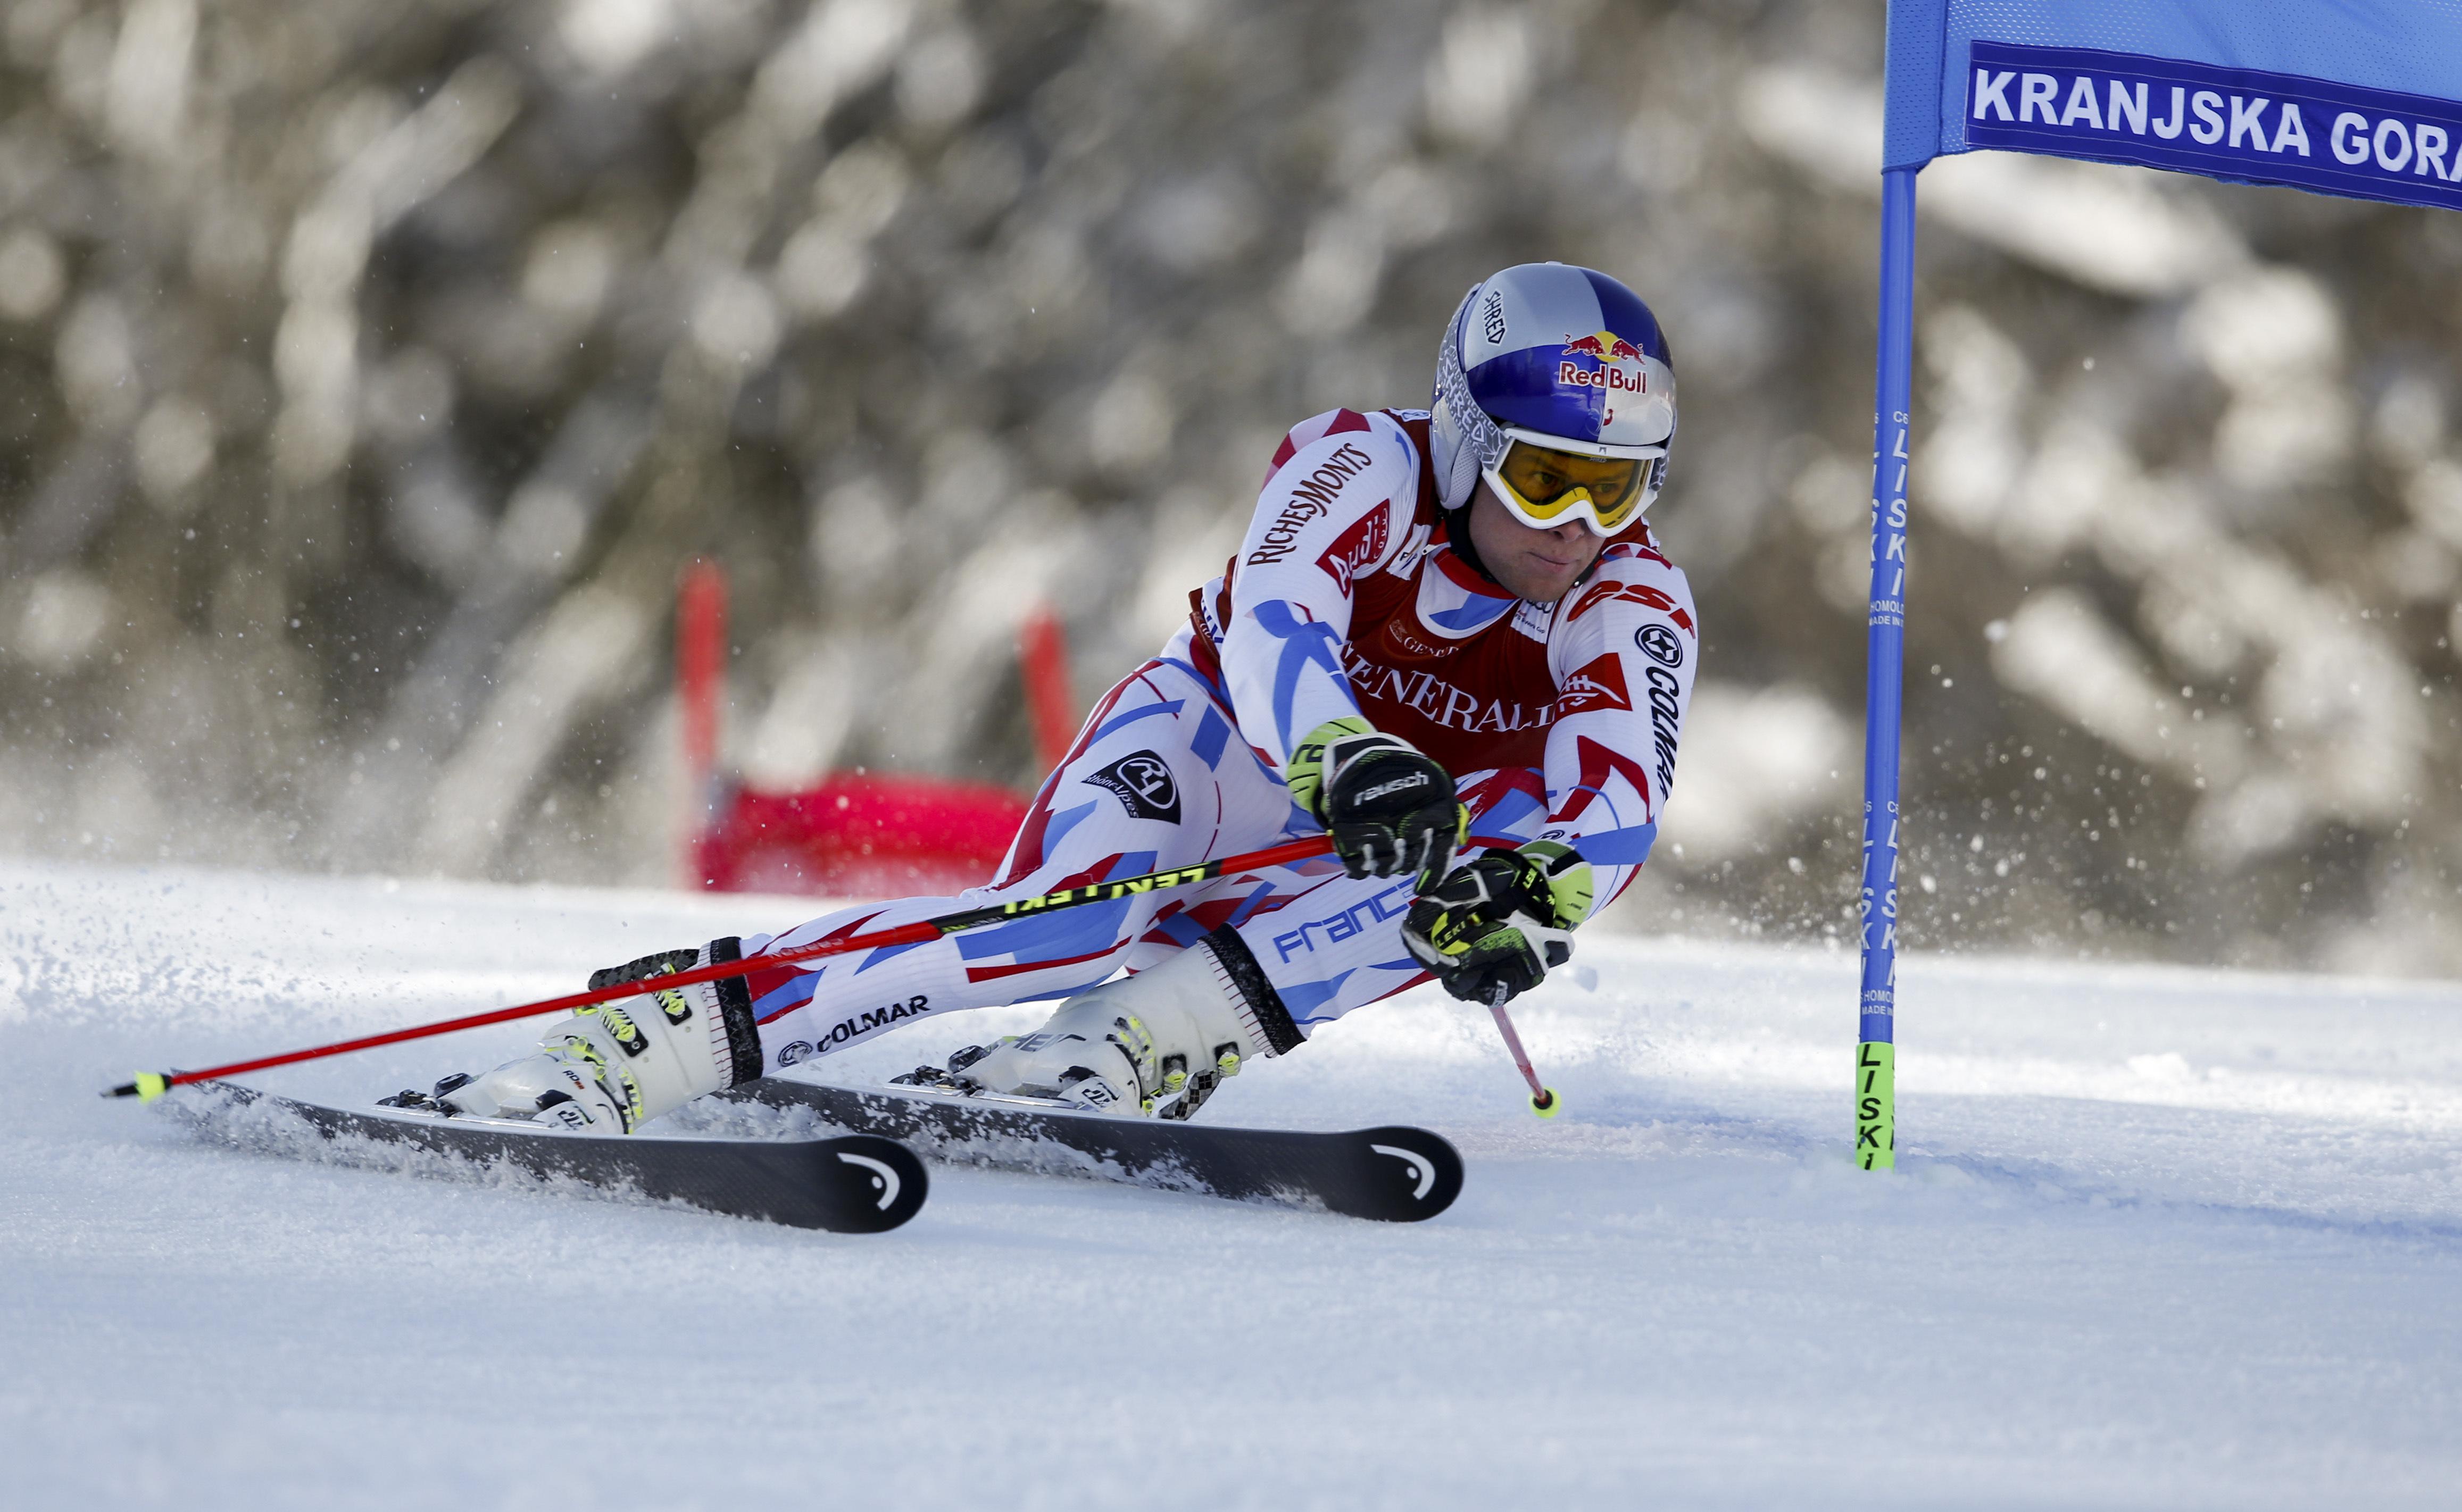 slovenia_alpine_skiing_world_cup-2dd89b7_r6711.jpeg